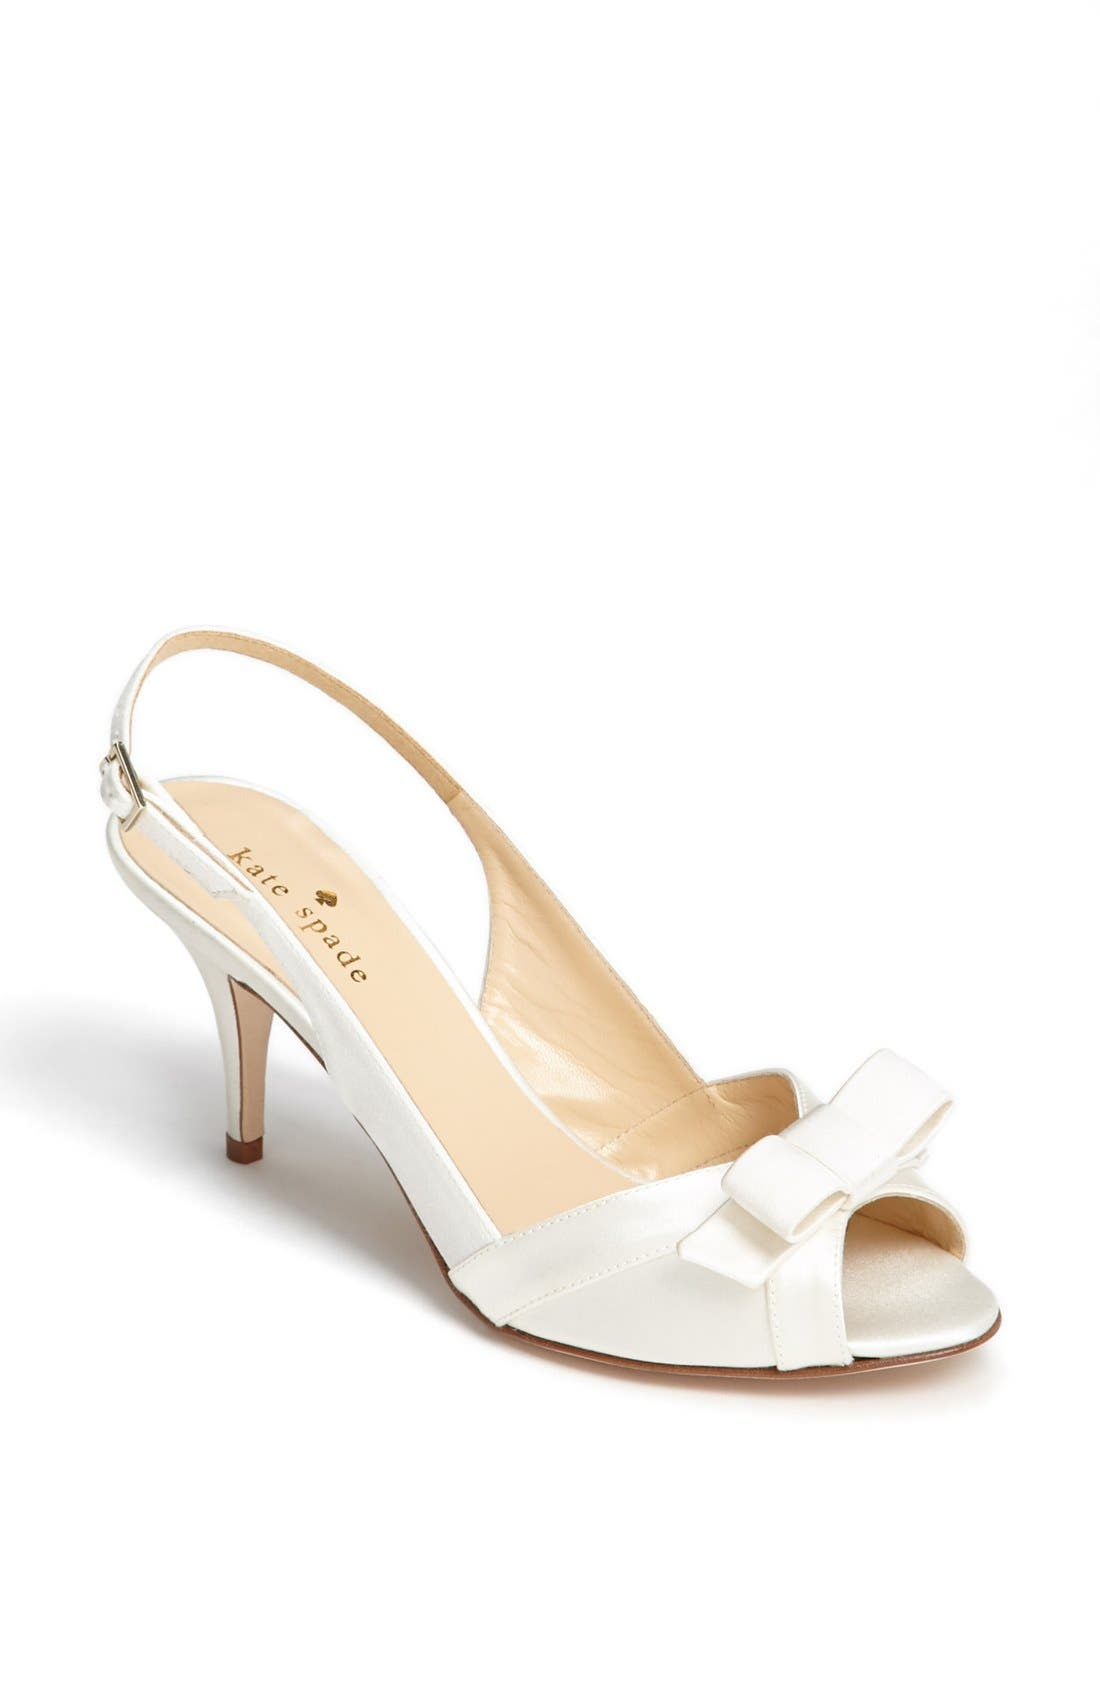 Main Image - kate spade new york 'silver' slingback sandal